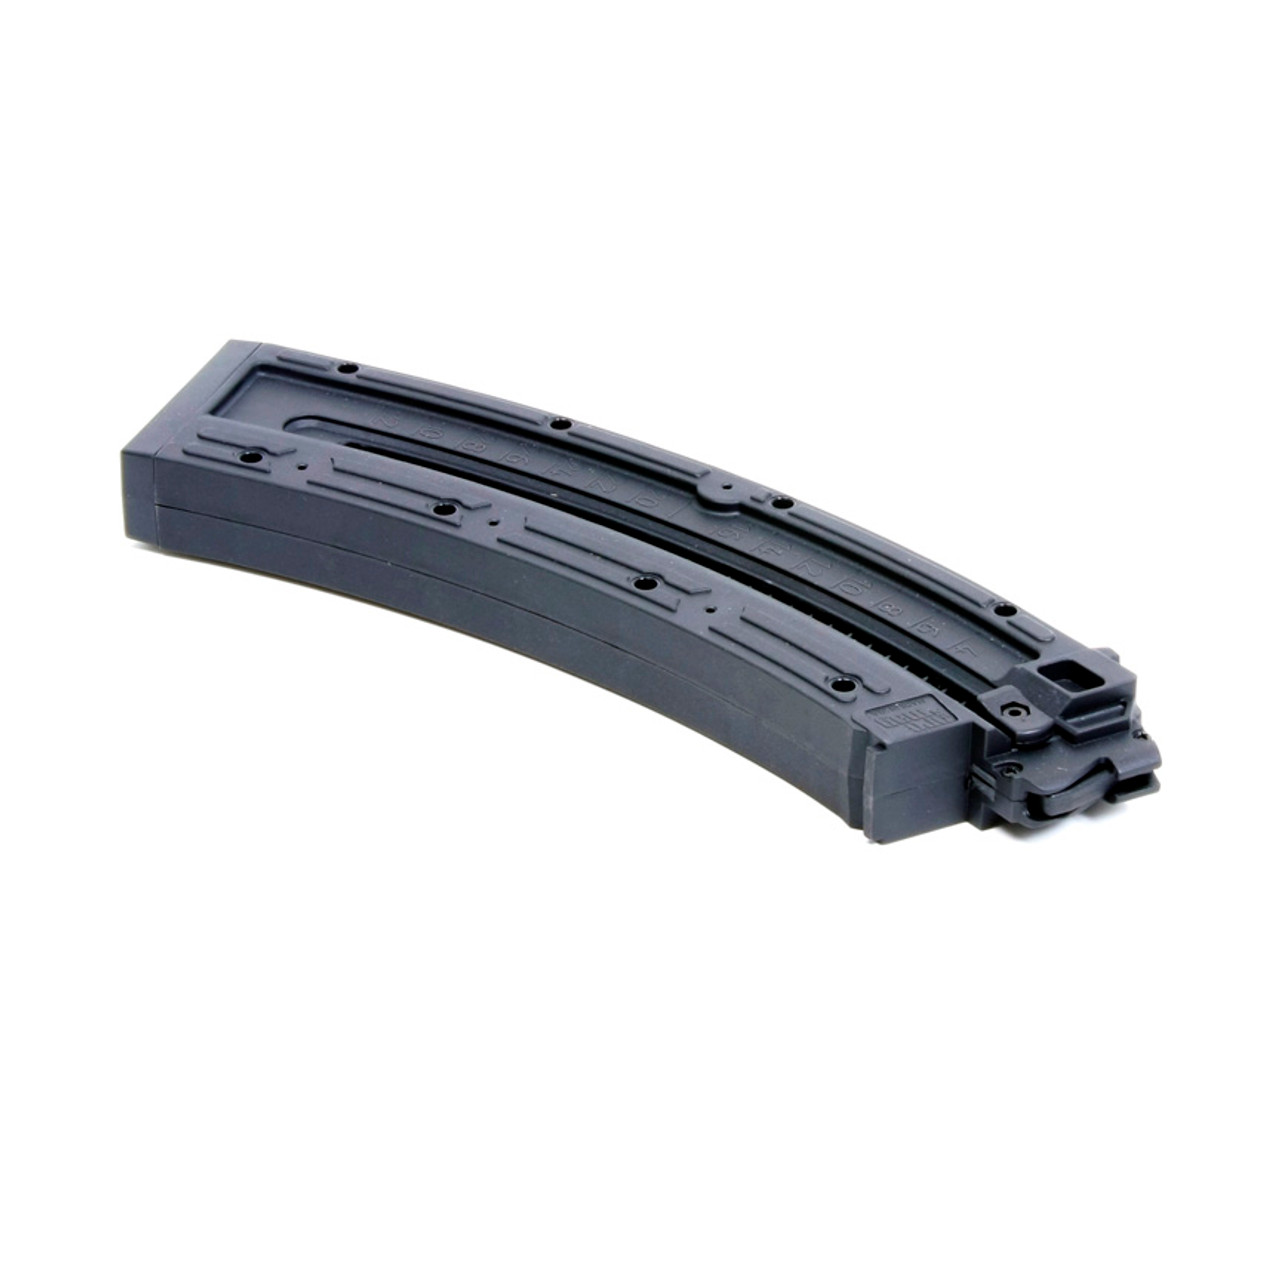 G S G German Sports Guns® AK-22 .22 LR (10) Rd - Black Polymer